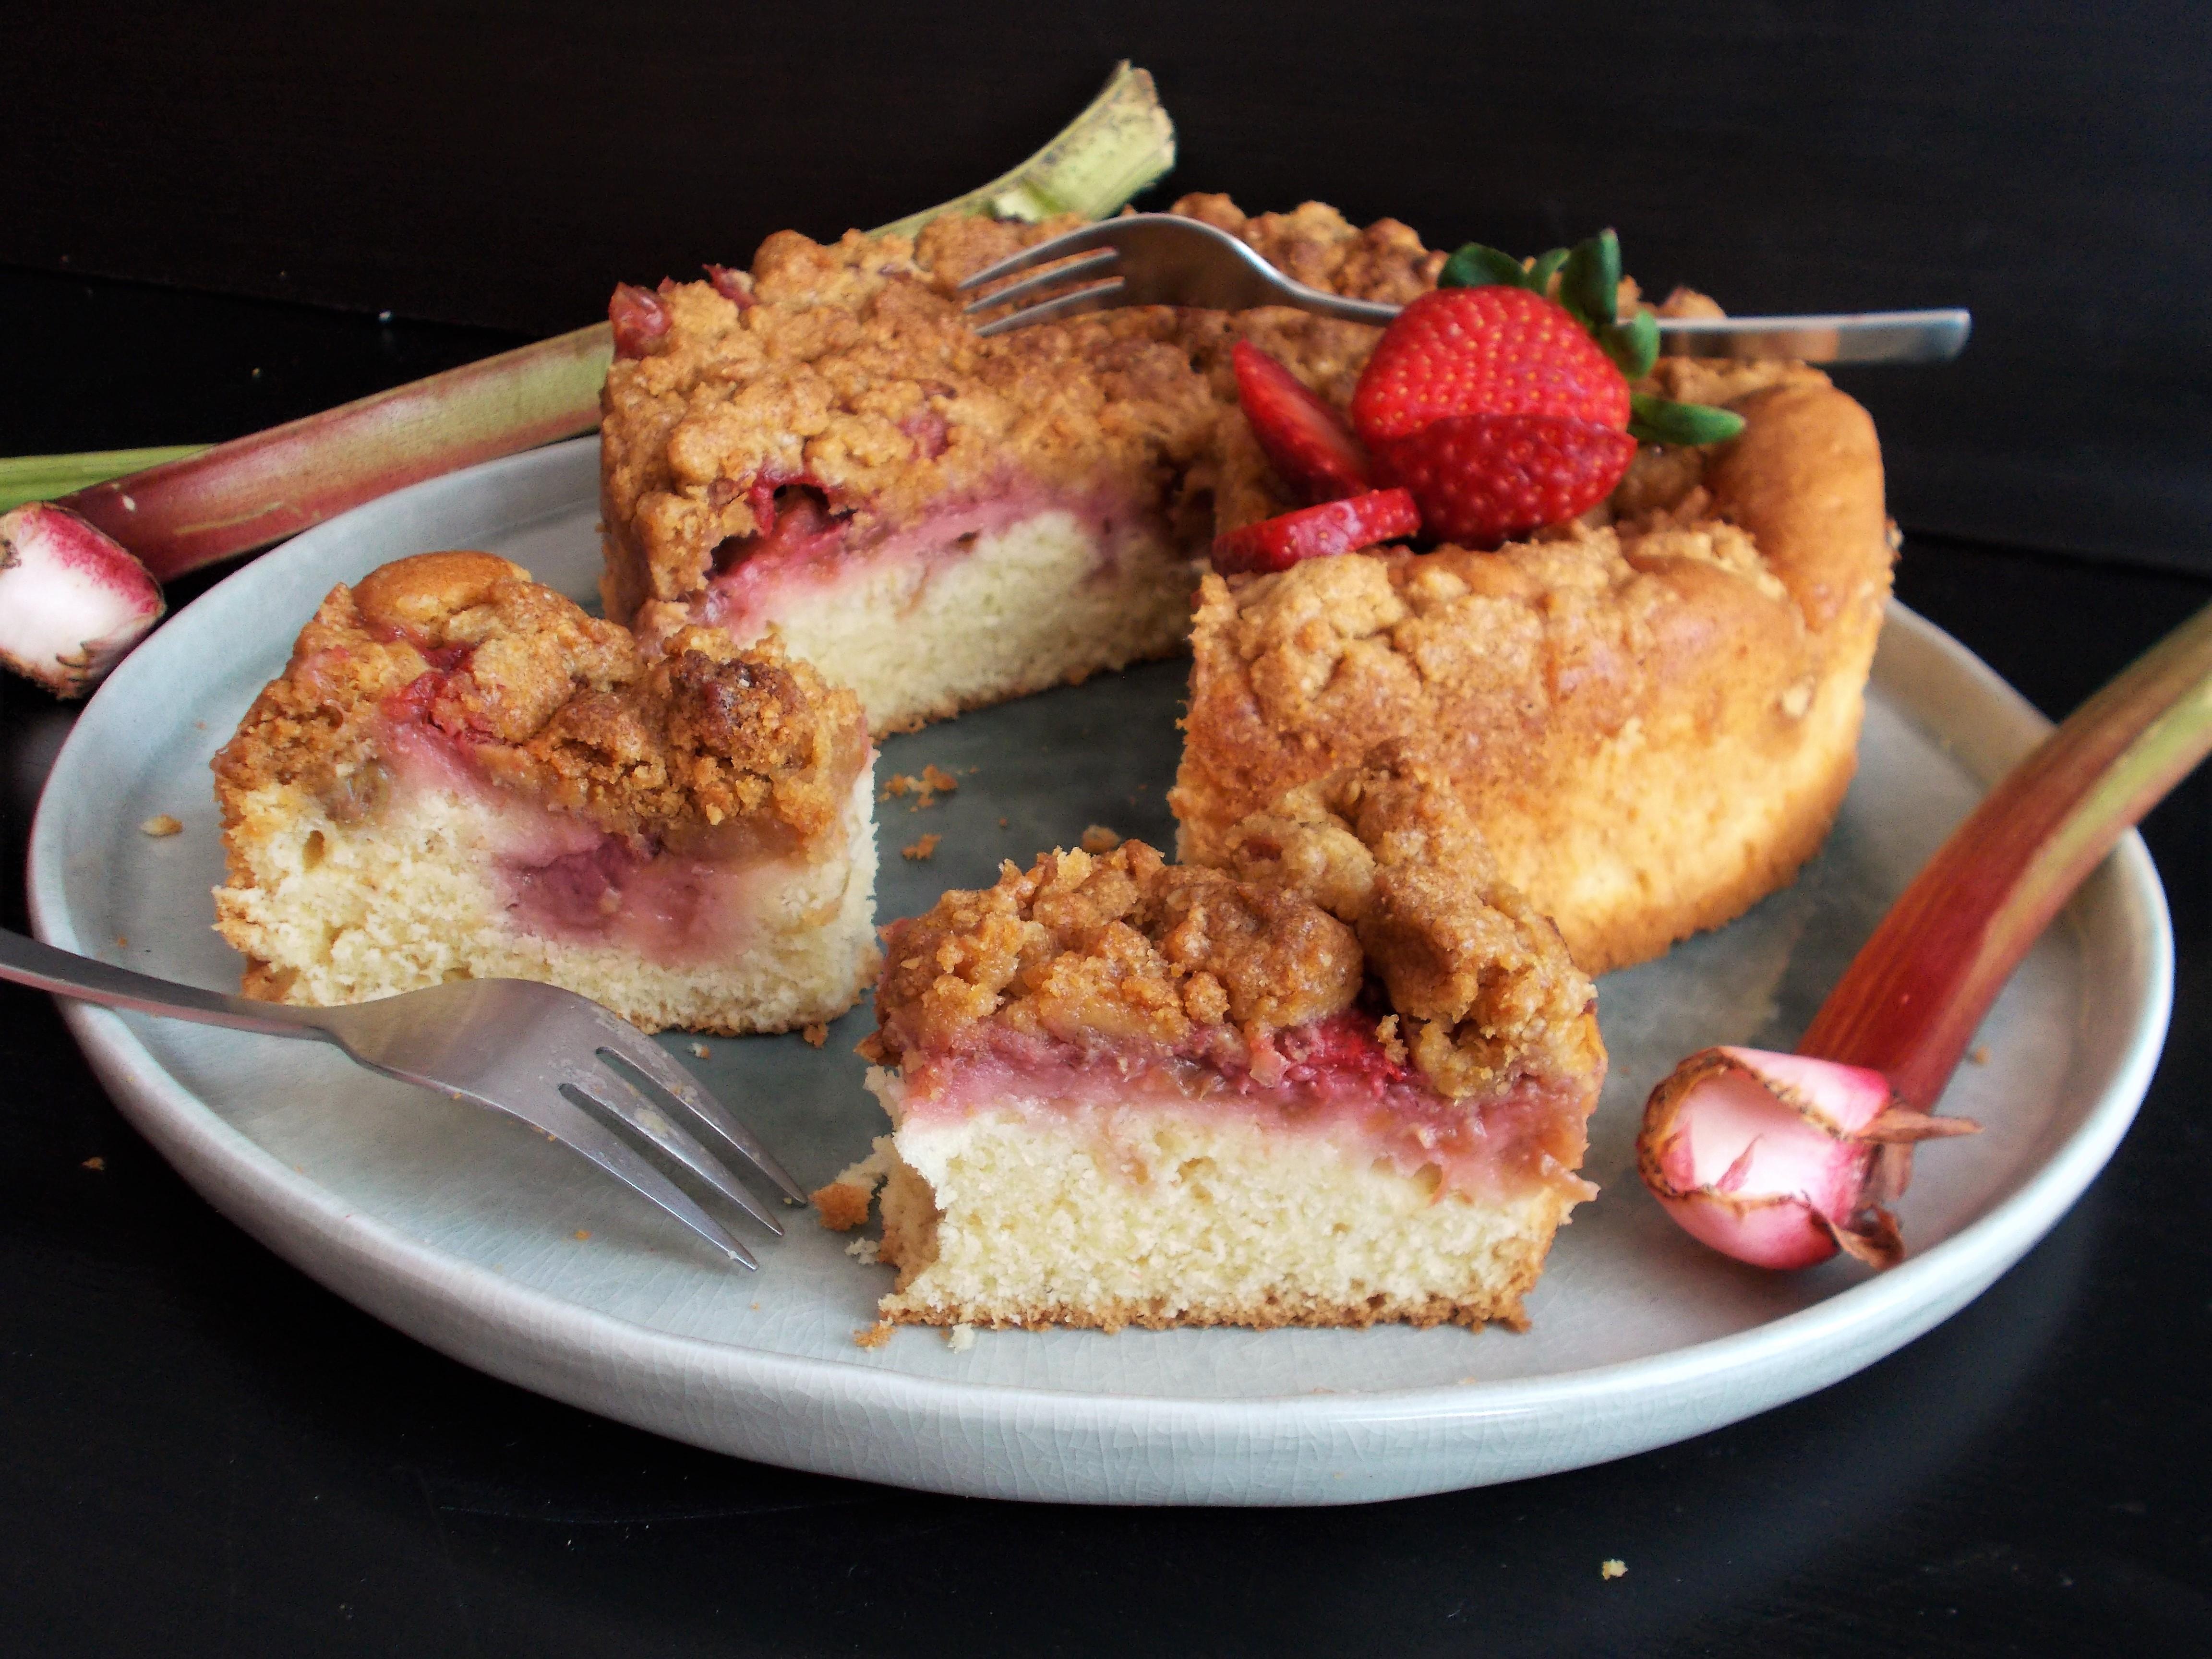 Crumb cake rhubarbe, fraise et fève tonka